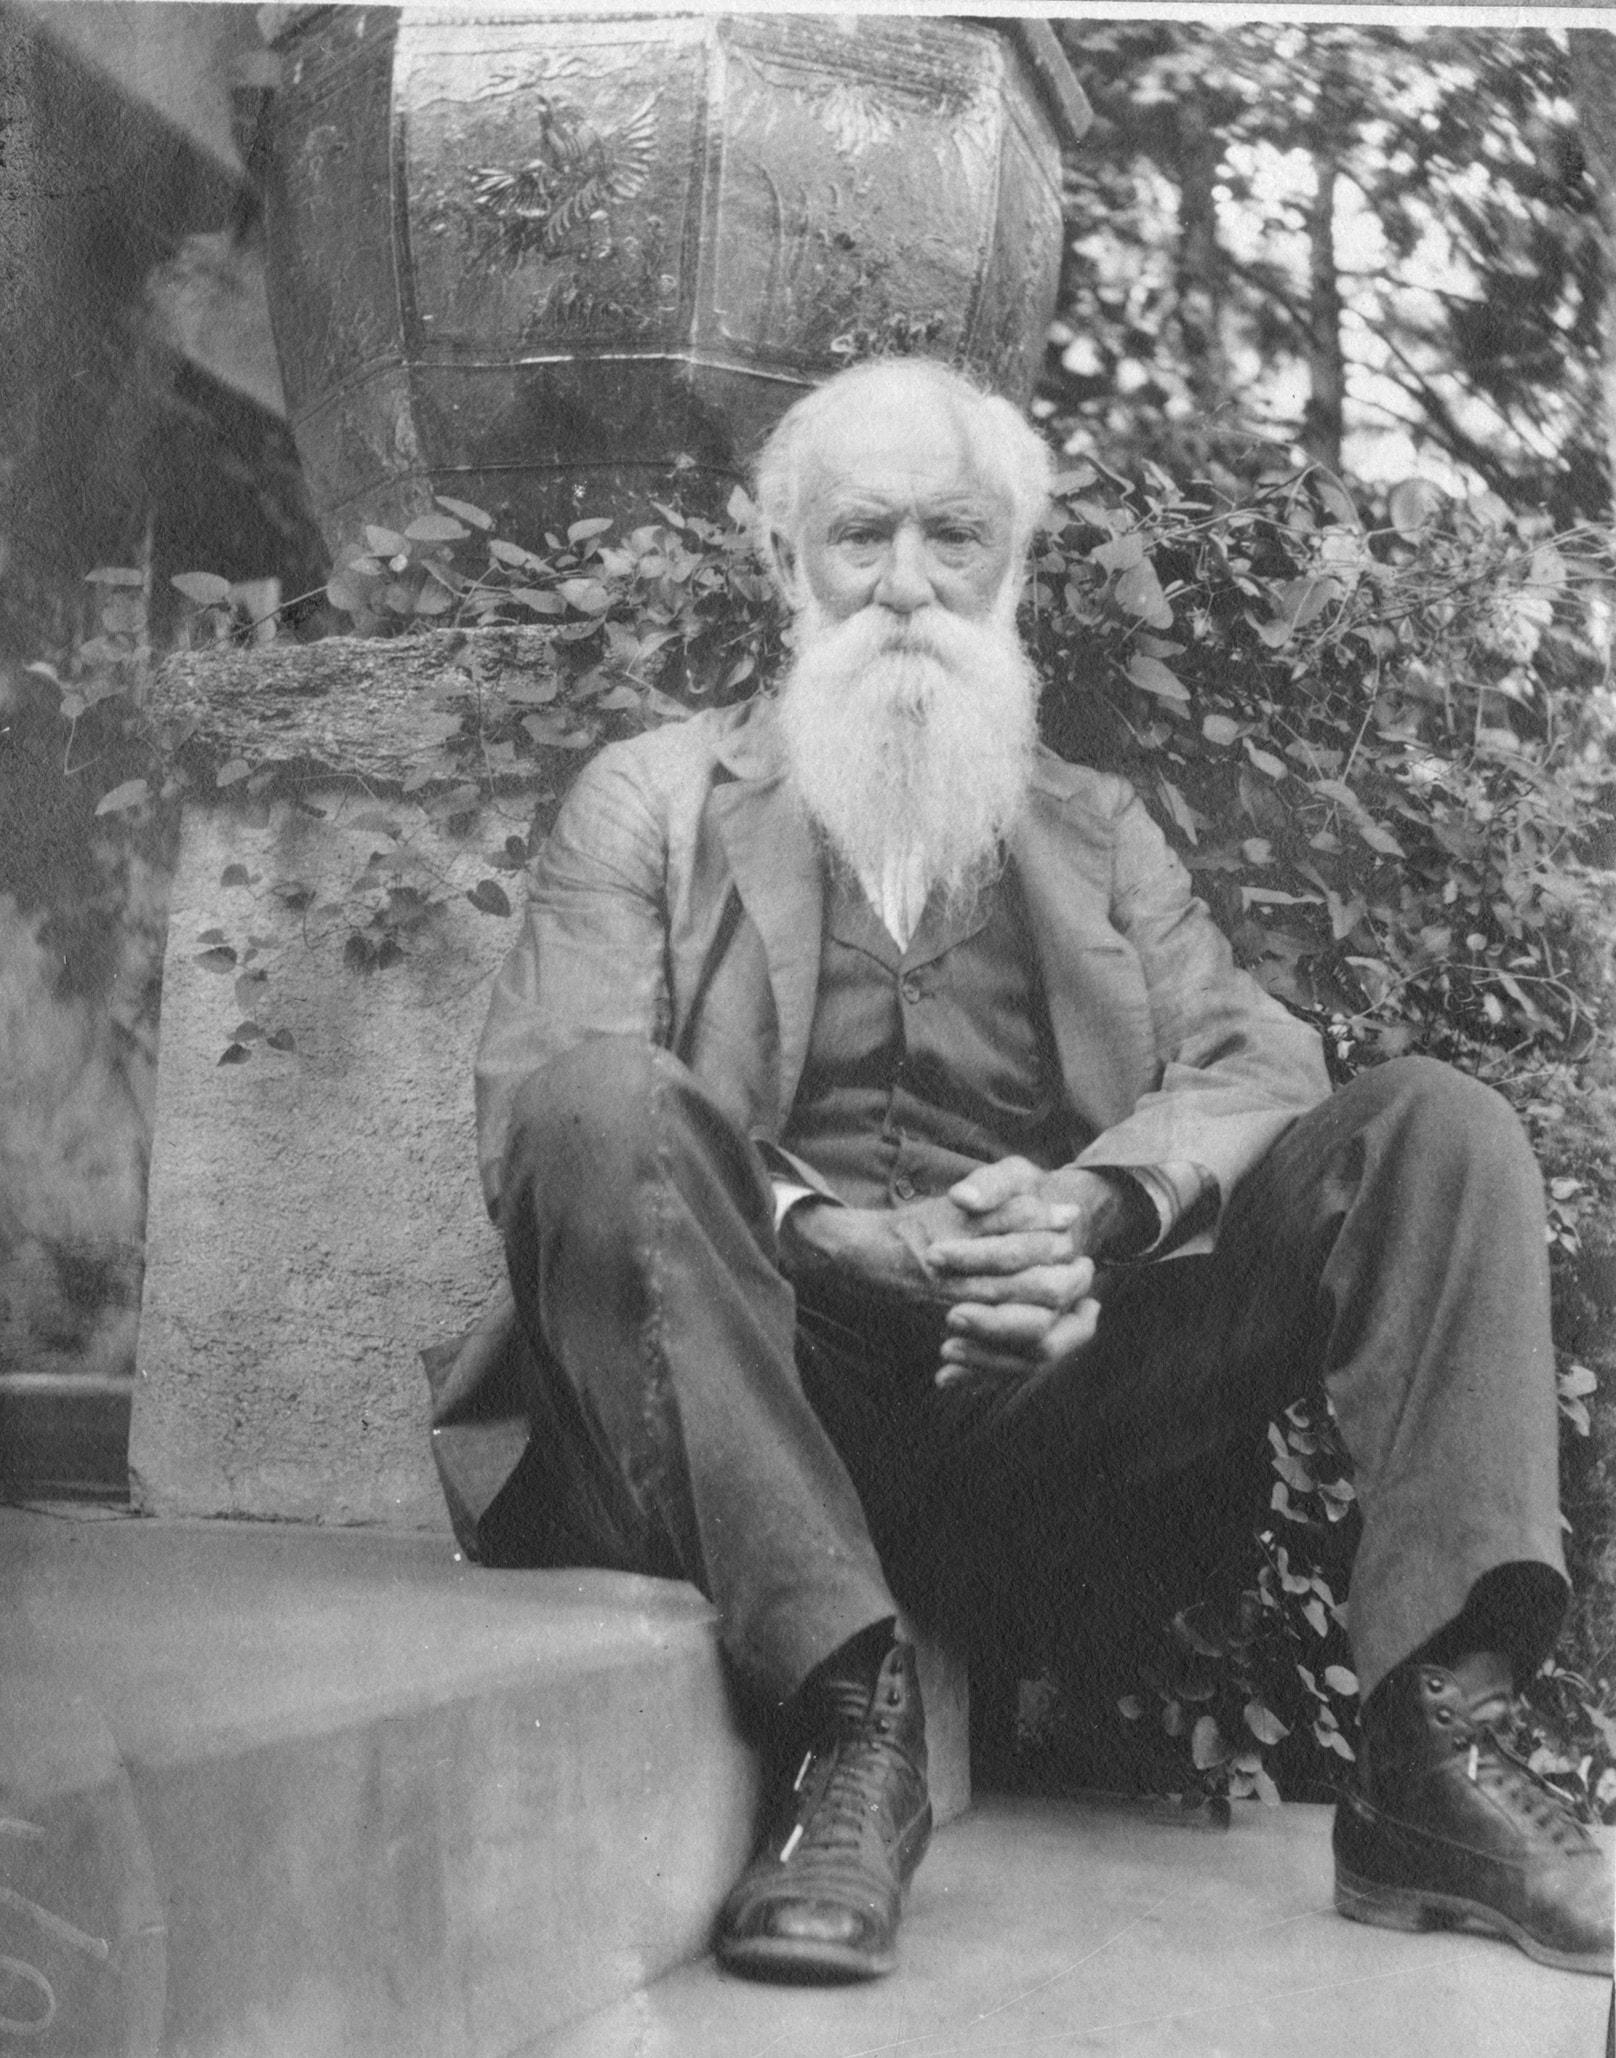 Seton and Burroughs Real and Sham Natural History Part III